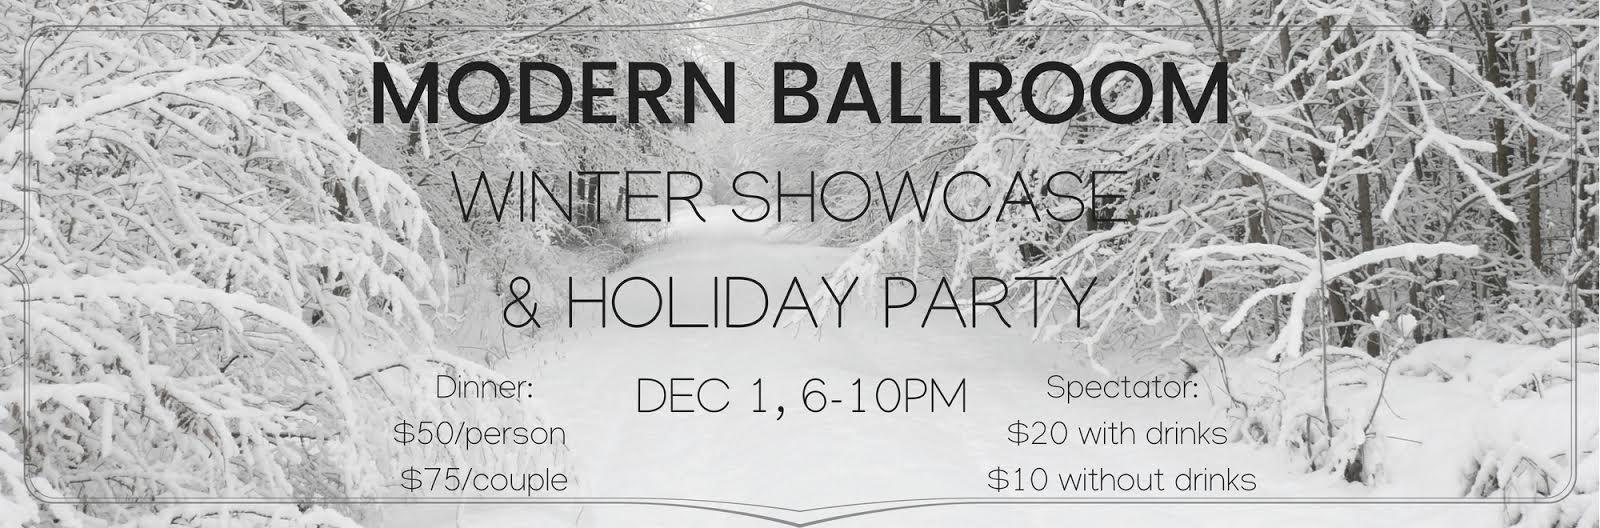 Modern Ballroom Dance Studio WInter Showcase